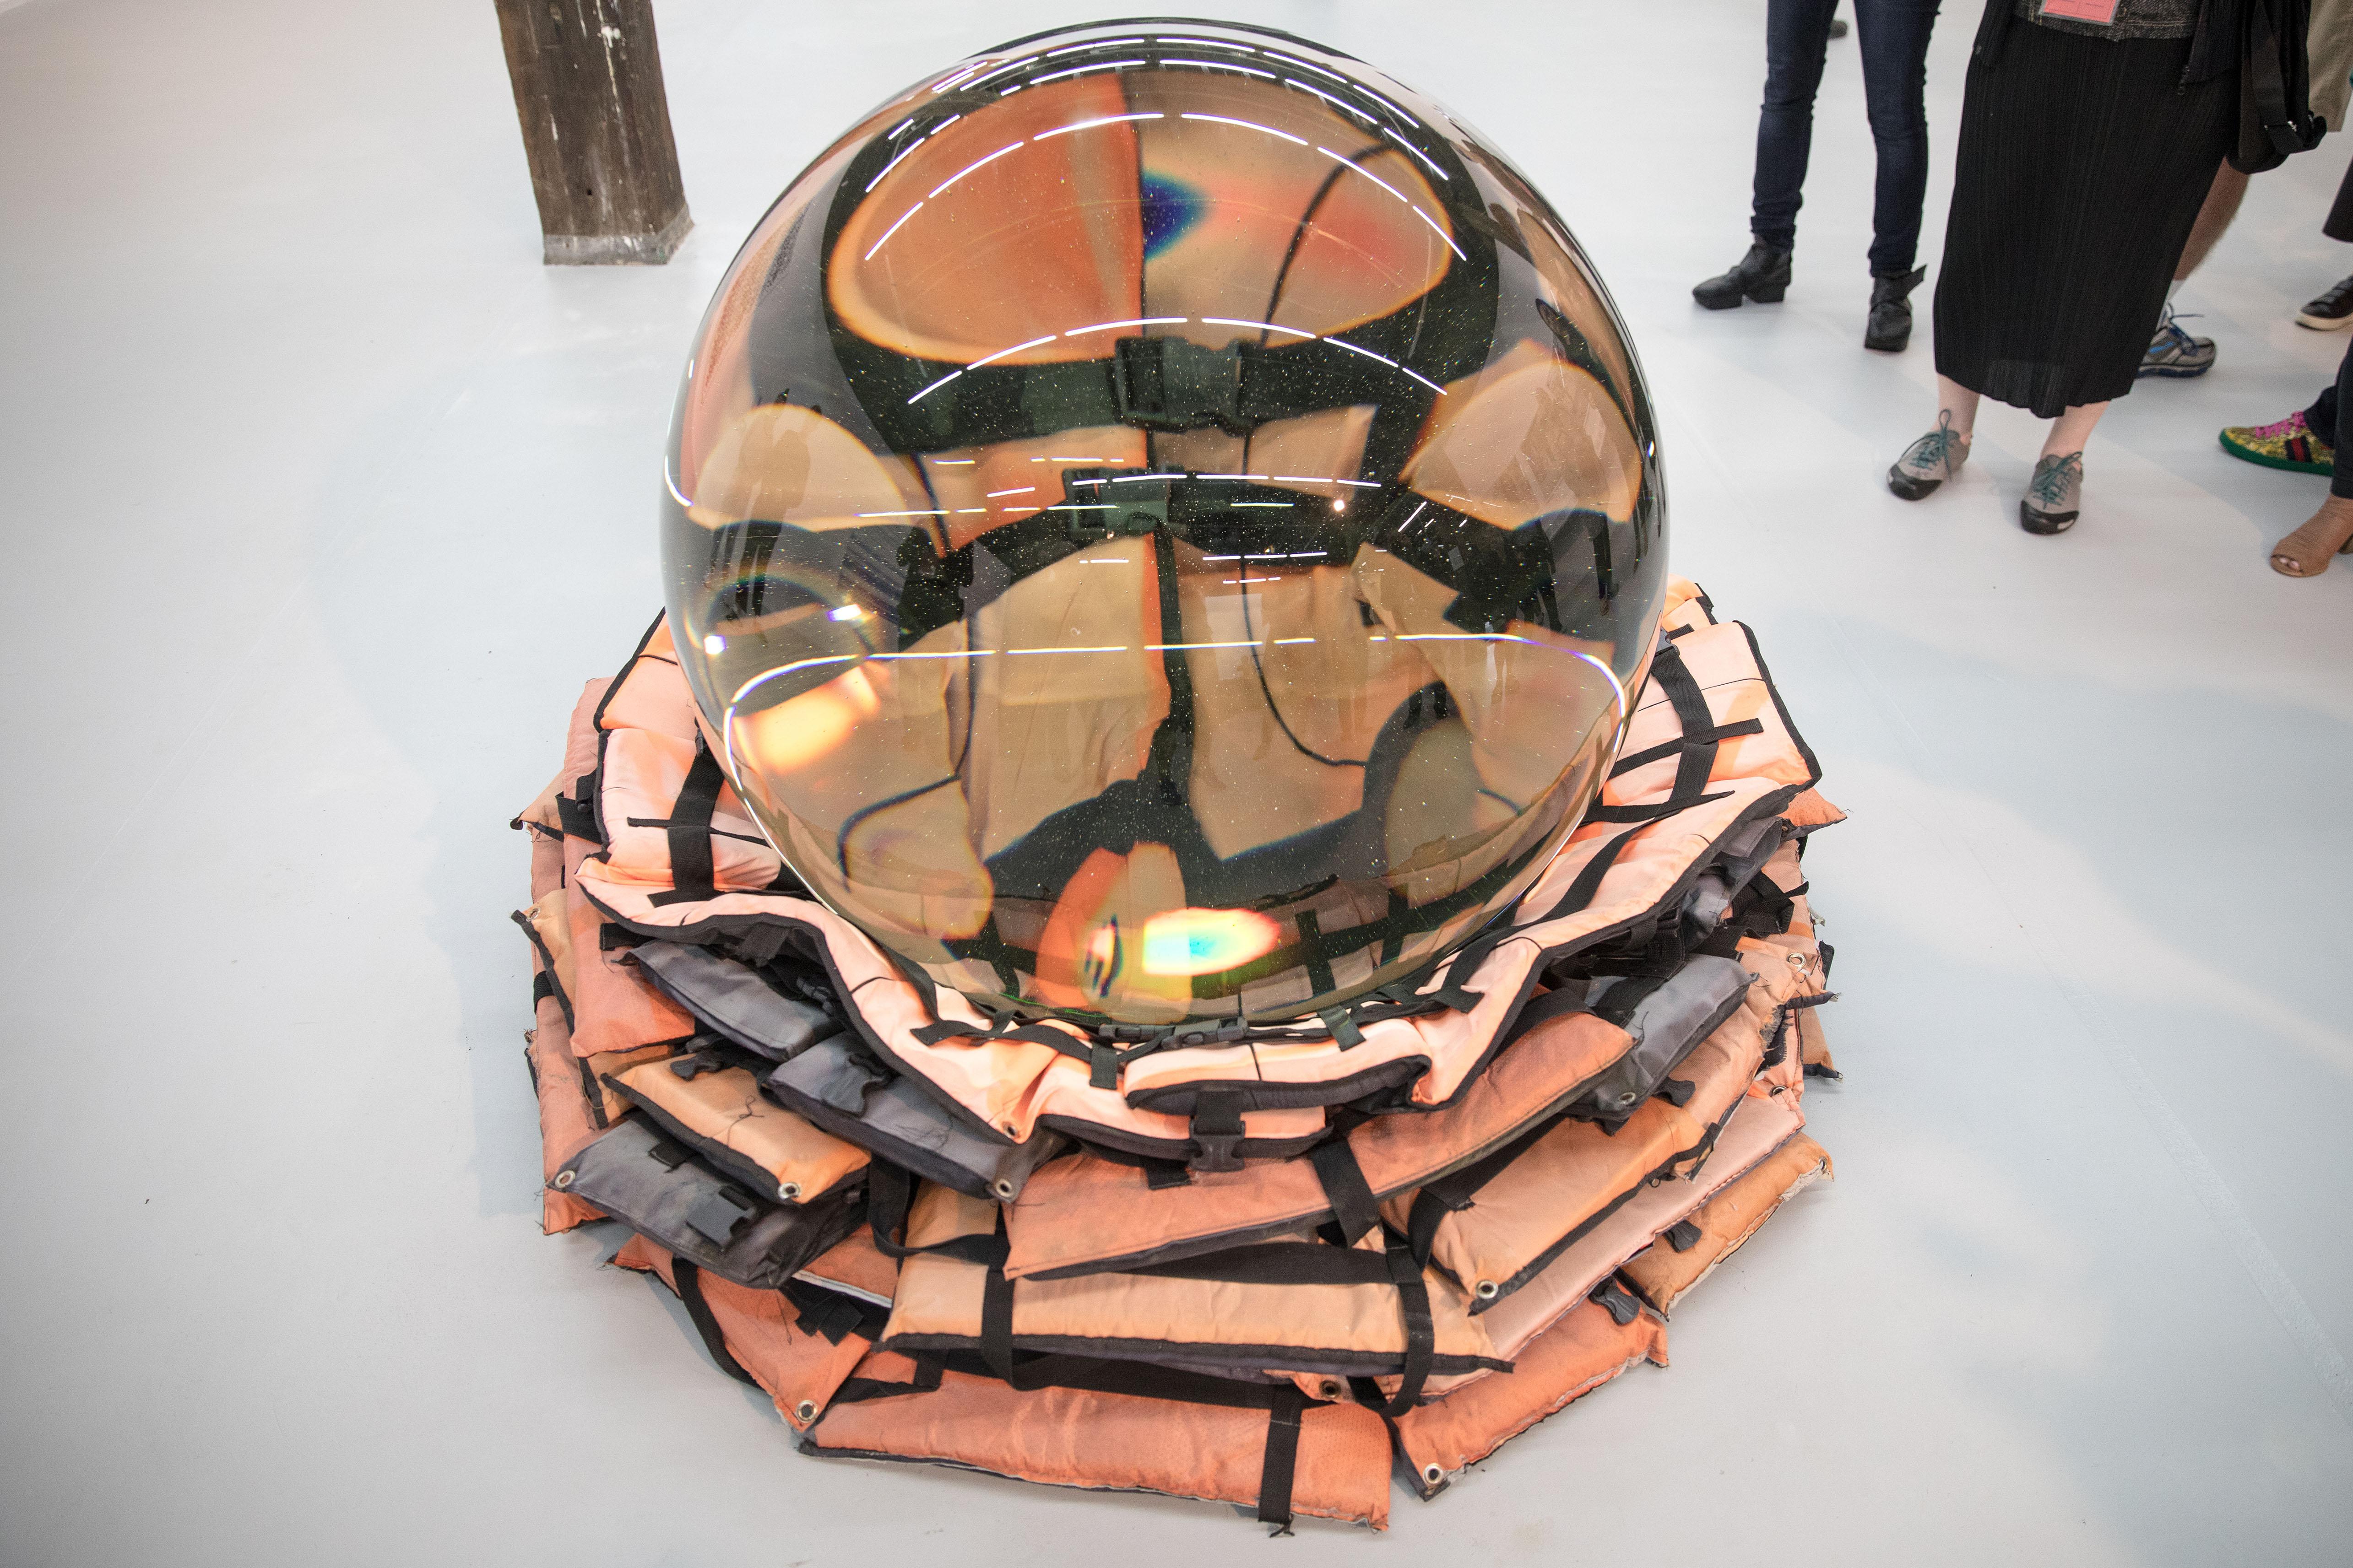 21st Biennale of Sydney Media Preview